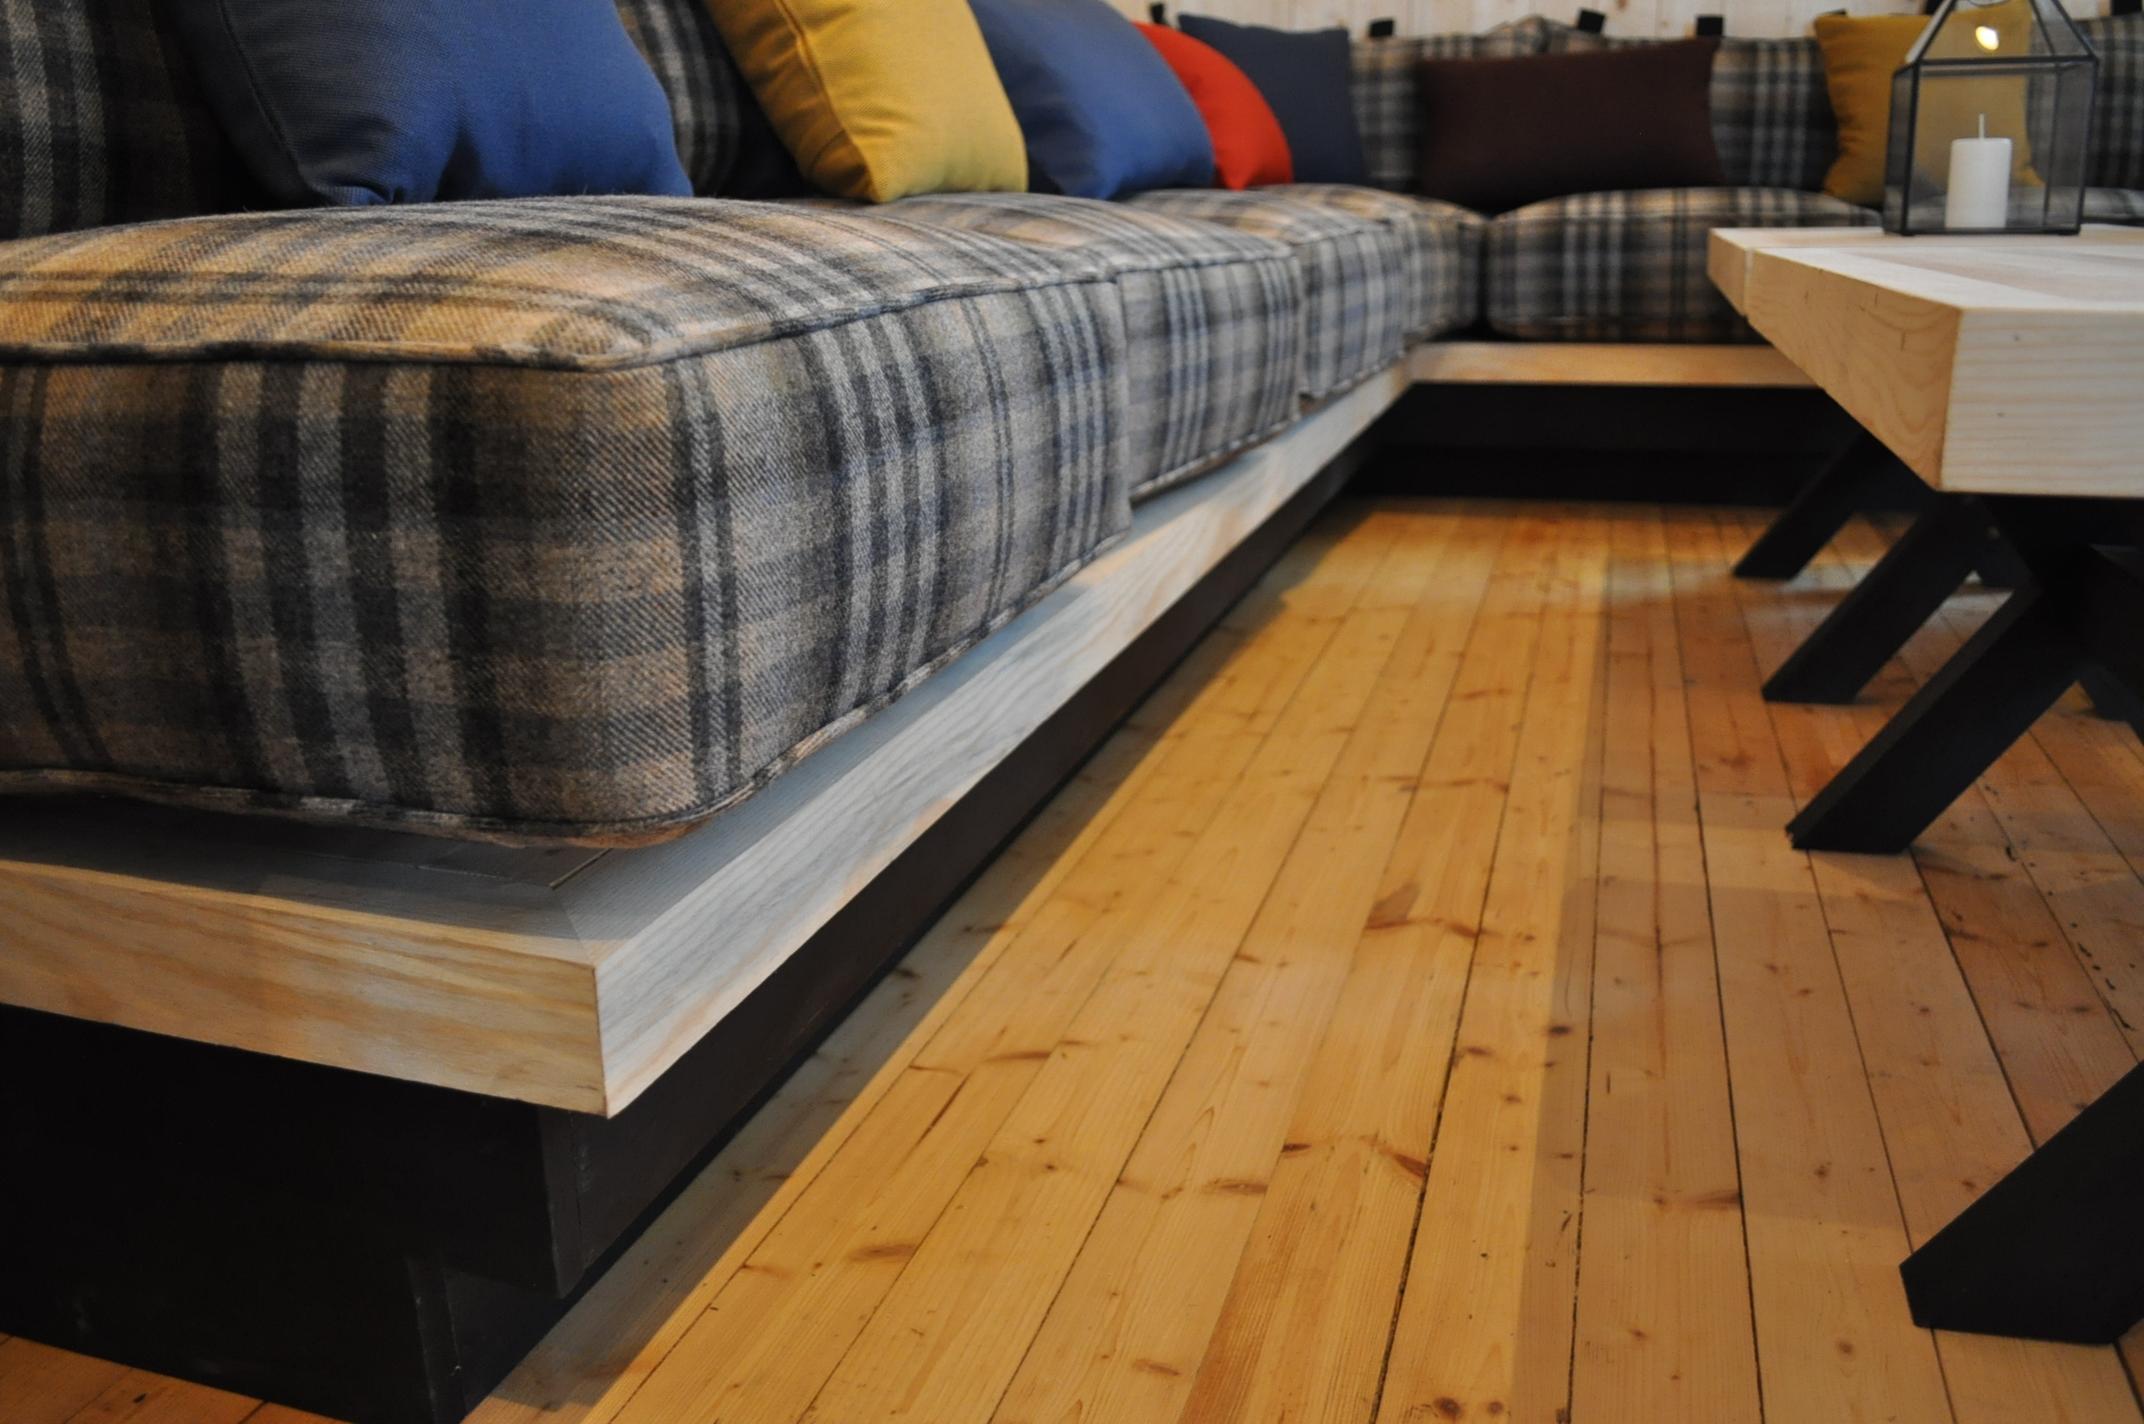 Allrom detaljer sofapute interiørdesign oslo.jpg